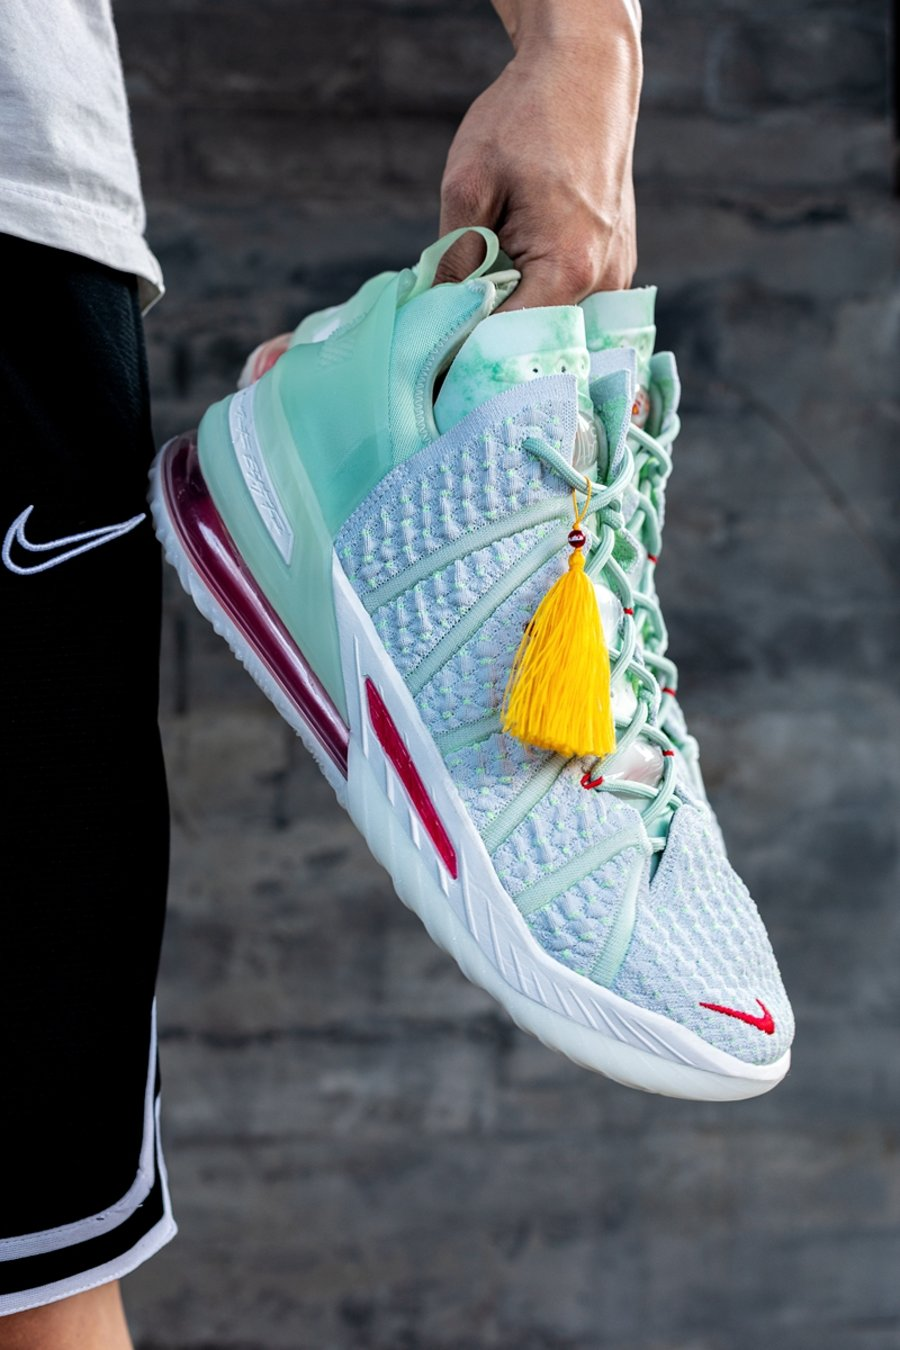 Nike,LeBron 18,发售  限量 600 套!紫禁重器 LeBron 18 双屉礼盒今晚发售